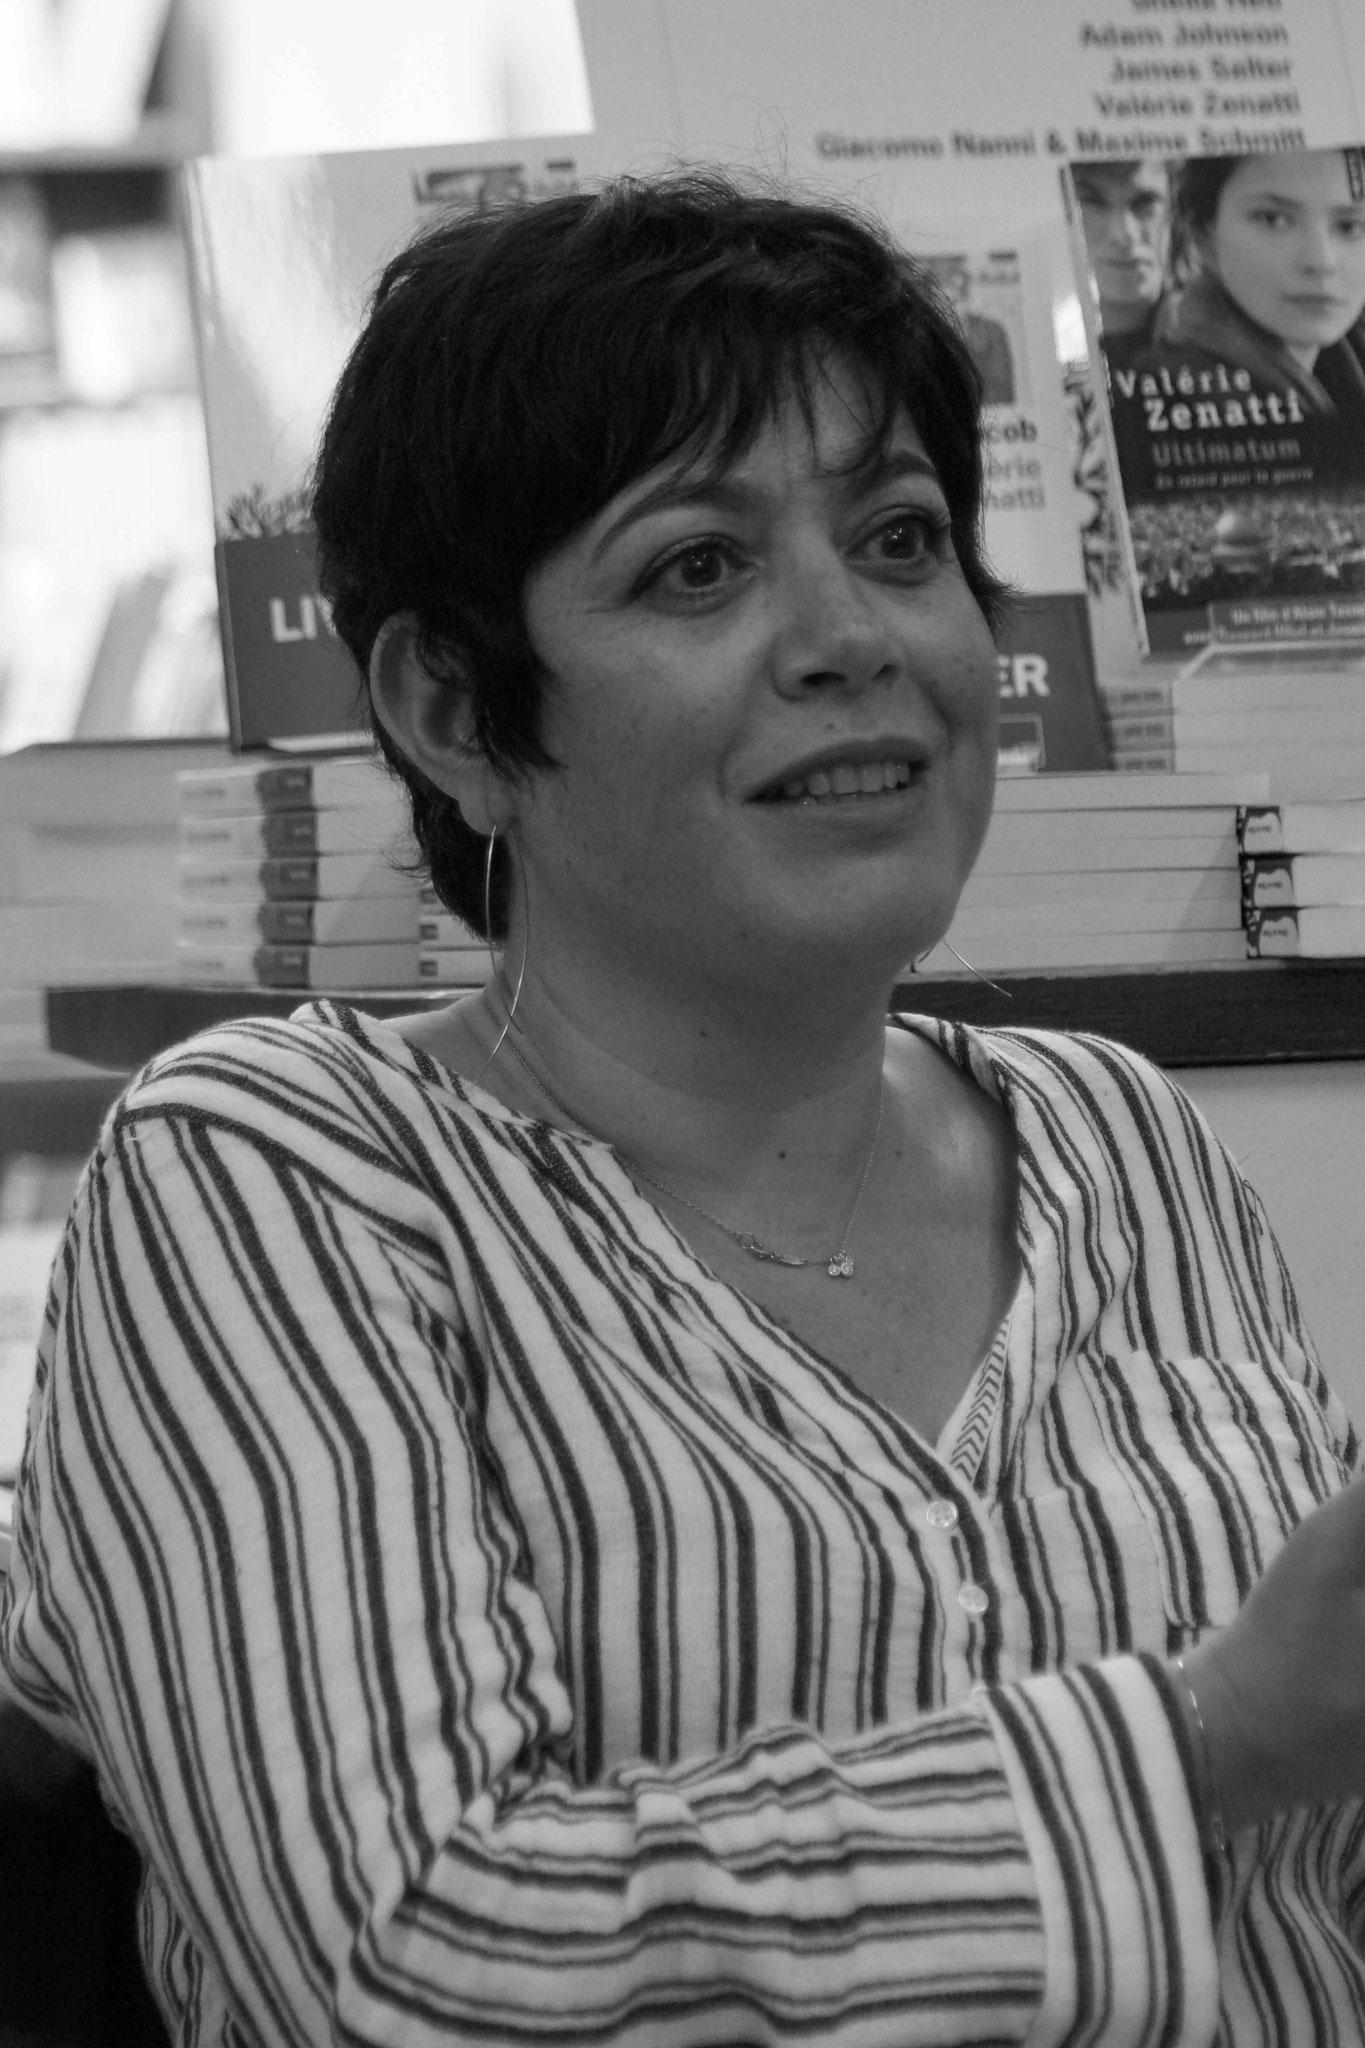 Valérie Zenatti ~ Rencontre à la Librairie Gwalarn pour son roman Jacob, Jacob ; Mardi 24 mai 2016